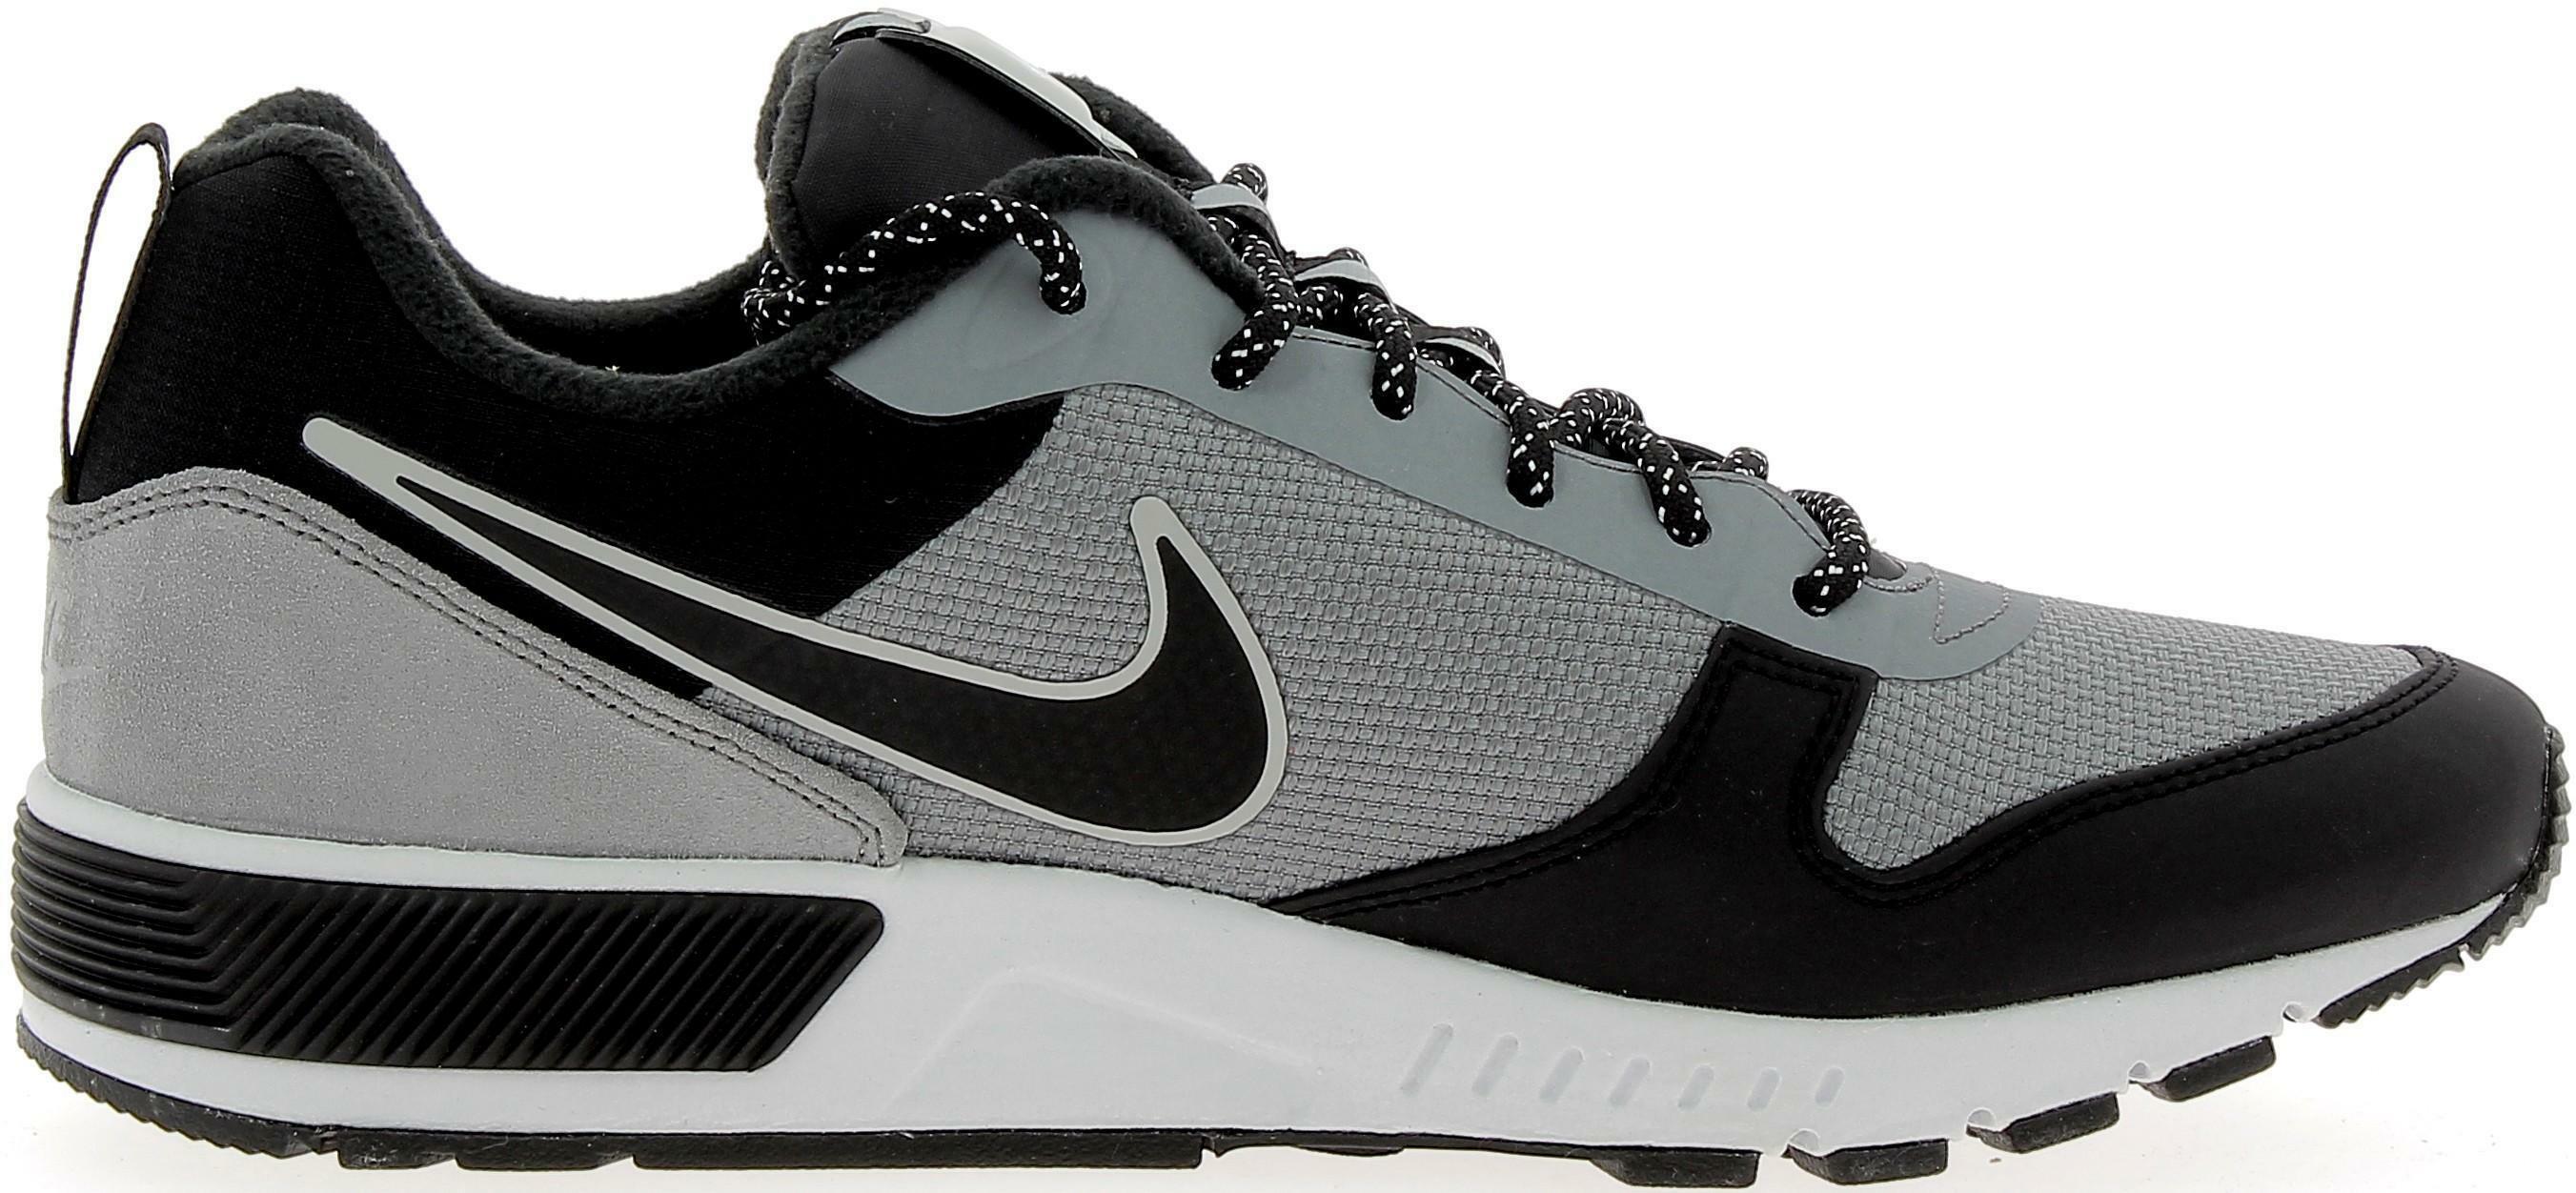 nike nike nightgazer trail scarpe sportive uomo grigio